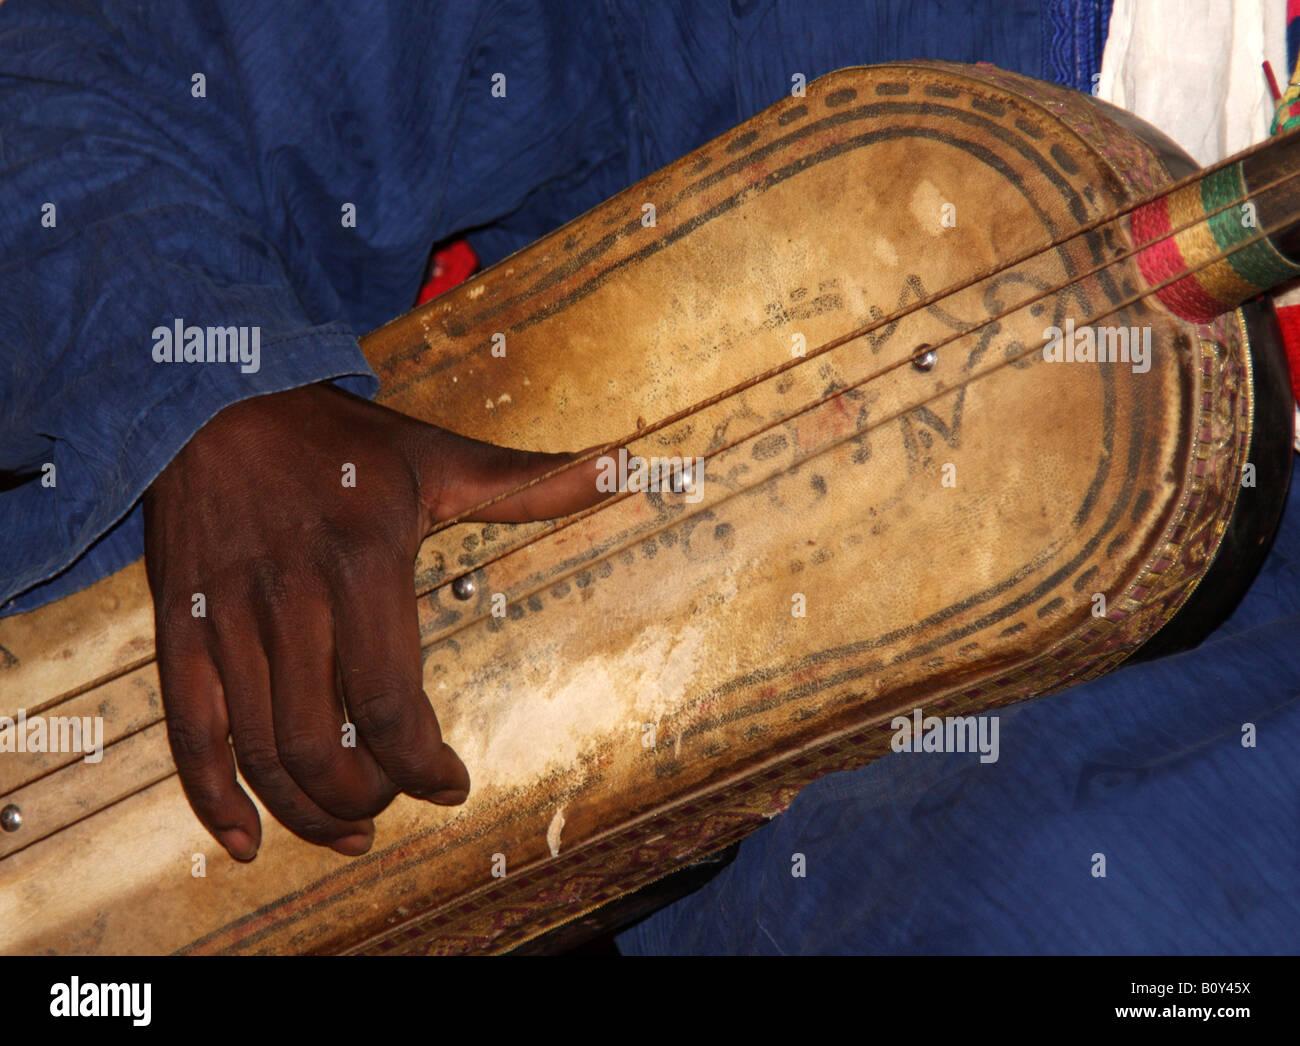 Hajhouj or guembri, Three stringed percussive lute, used in traditional Gnawa or Gnauoa Music of Khamlia - Stock Image